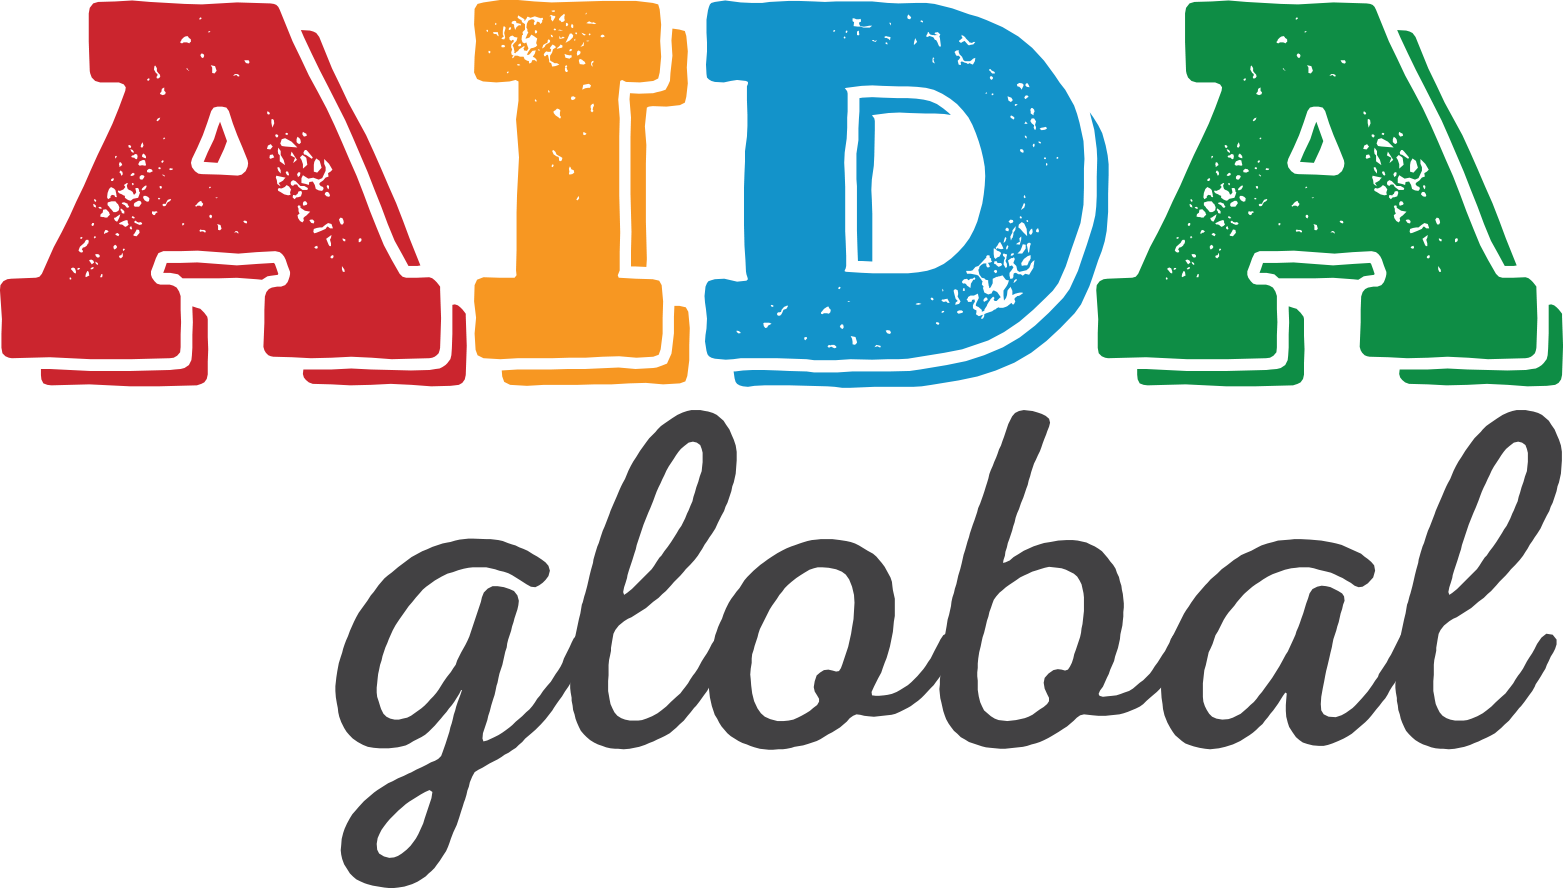 AidaGlobal.com